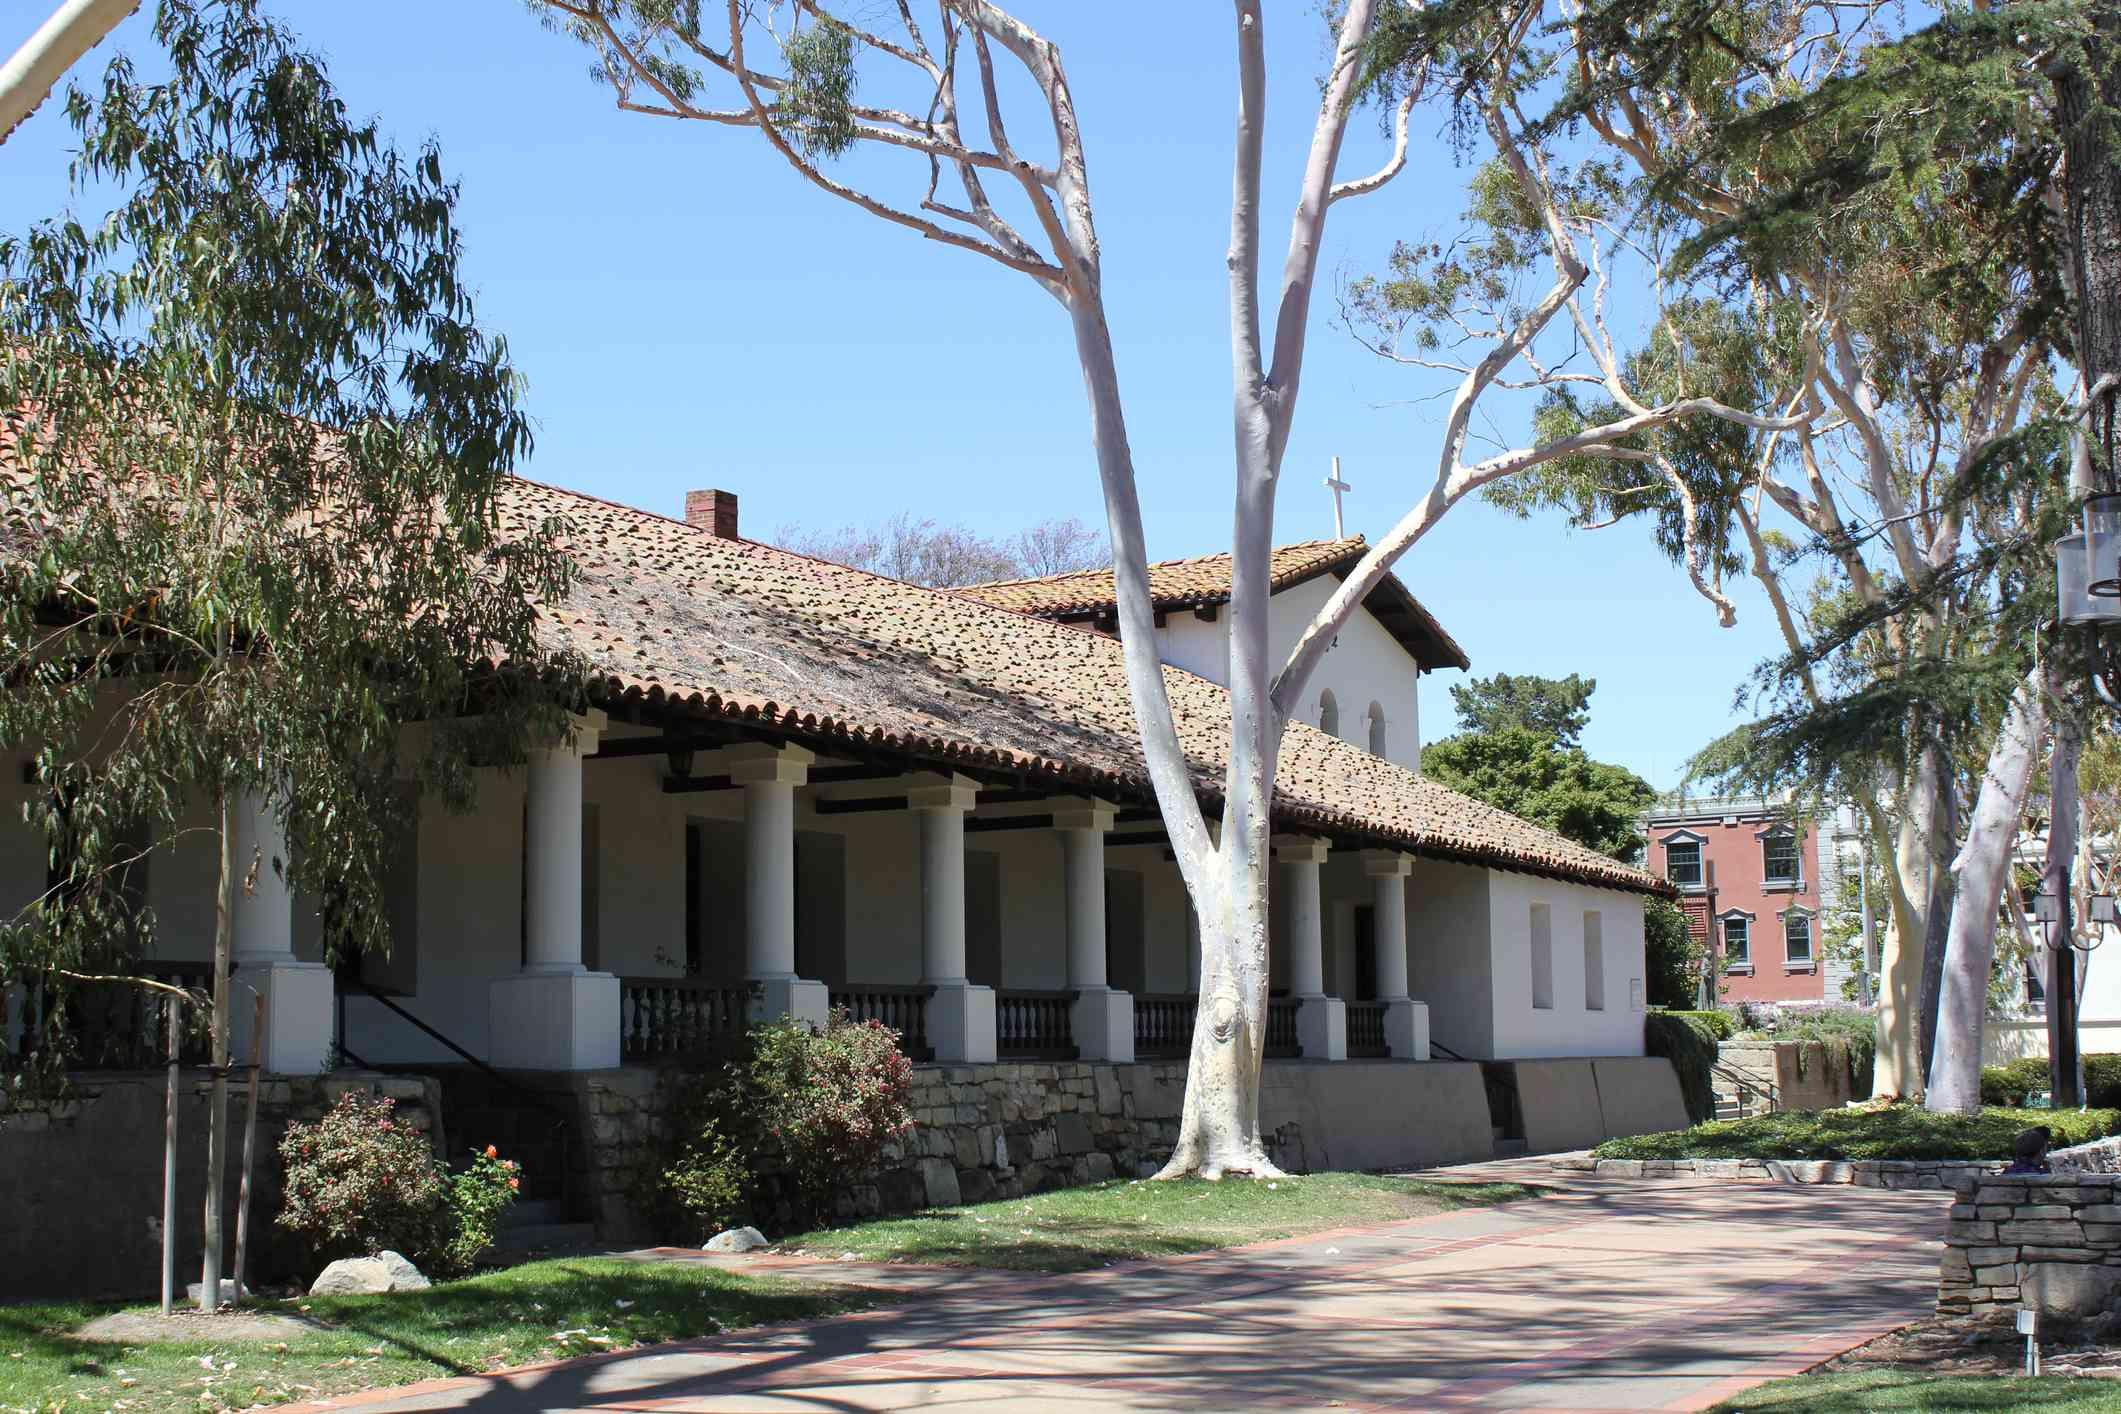 Mission San Luis Obispo Exterior